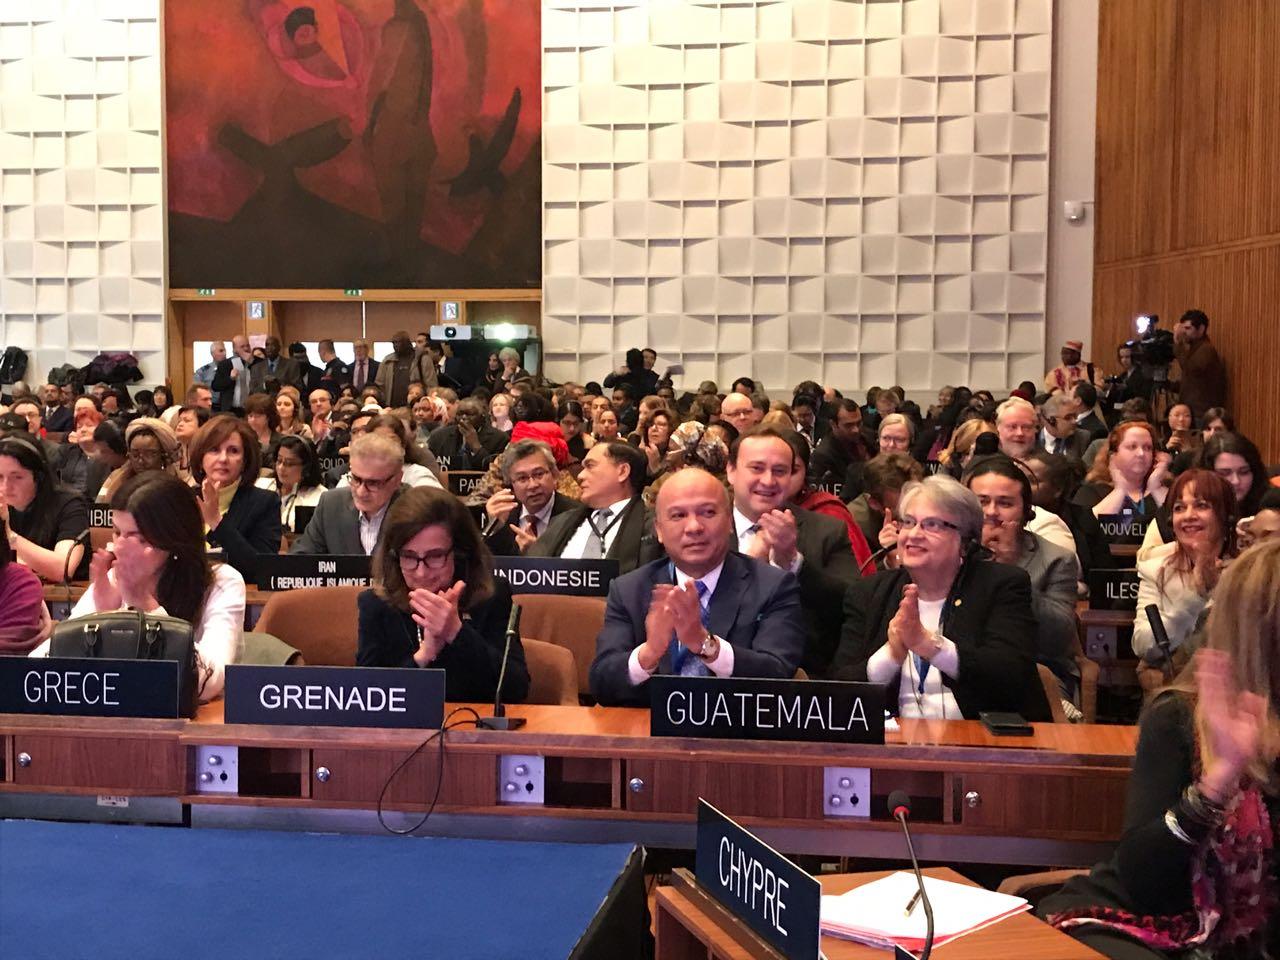 Guatemala electa Comité de UNESCO